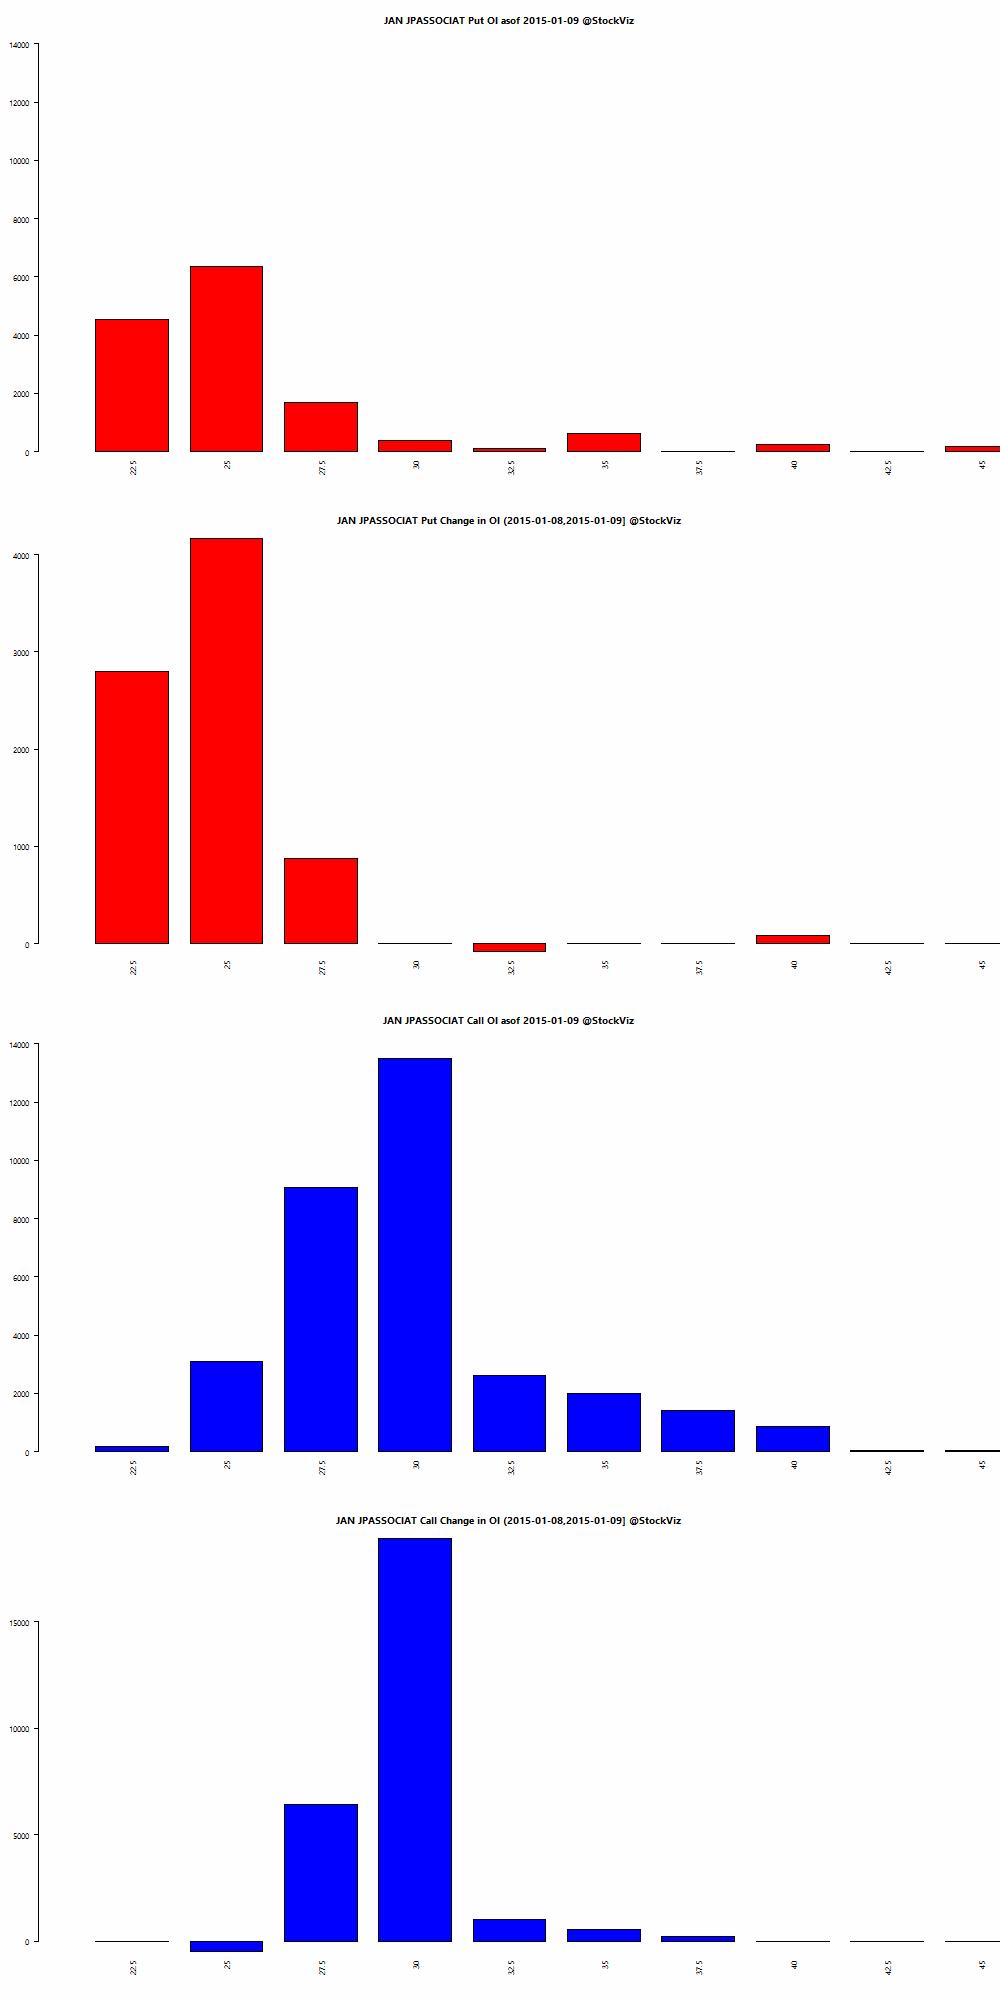 JAN JPASSOCIAT OI chart